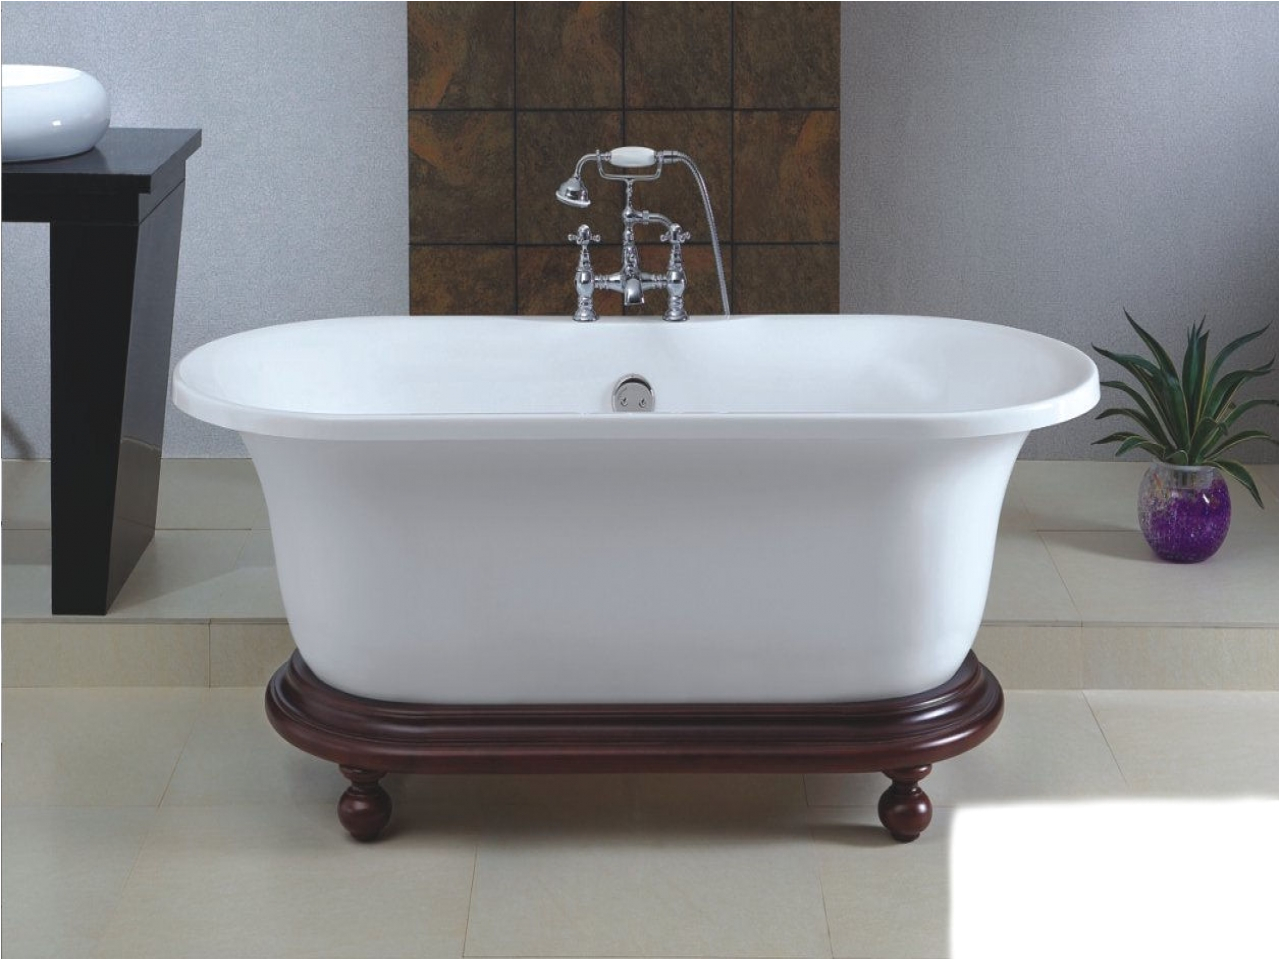 Vintage Bathtub for Sale Pedestal Tub Old Fashioned Tub Bathtubs for Sale Old